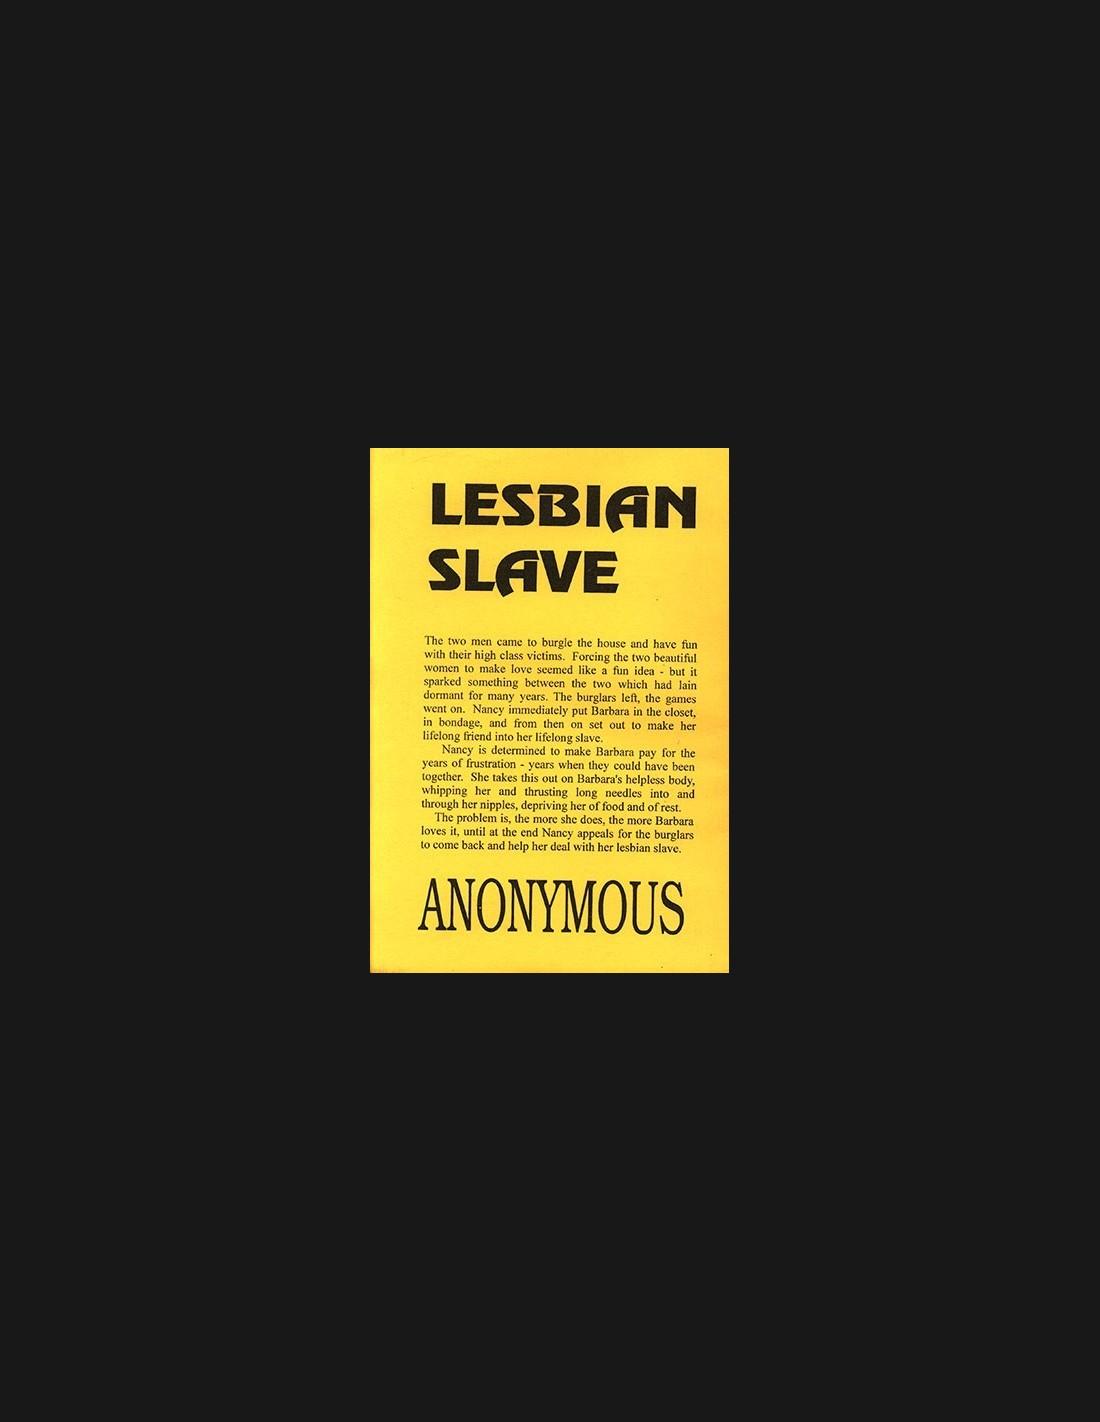 lesbians anonymous